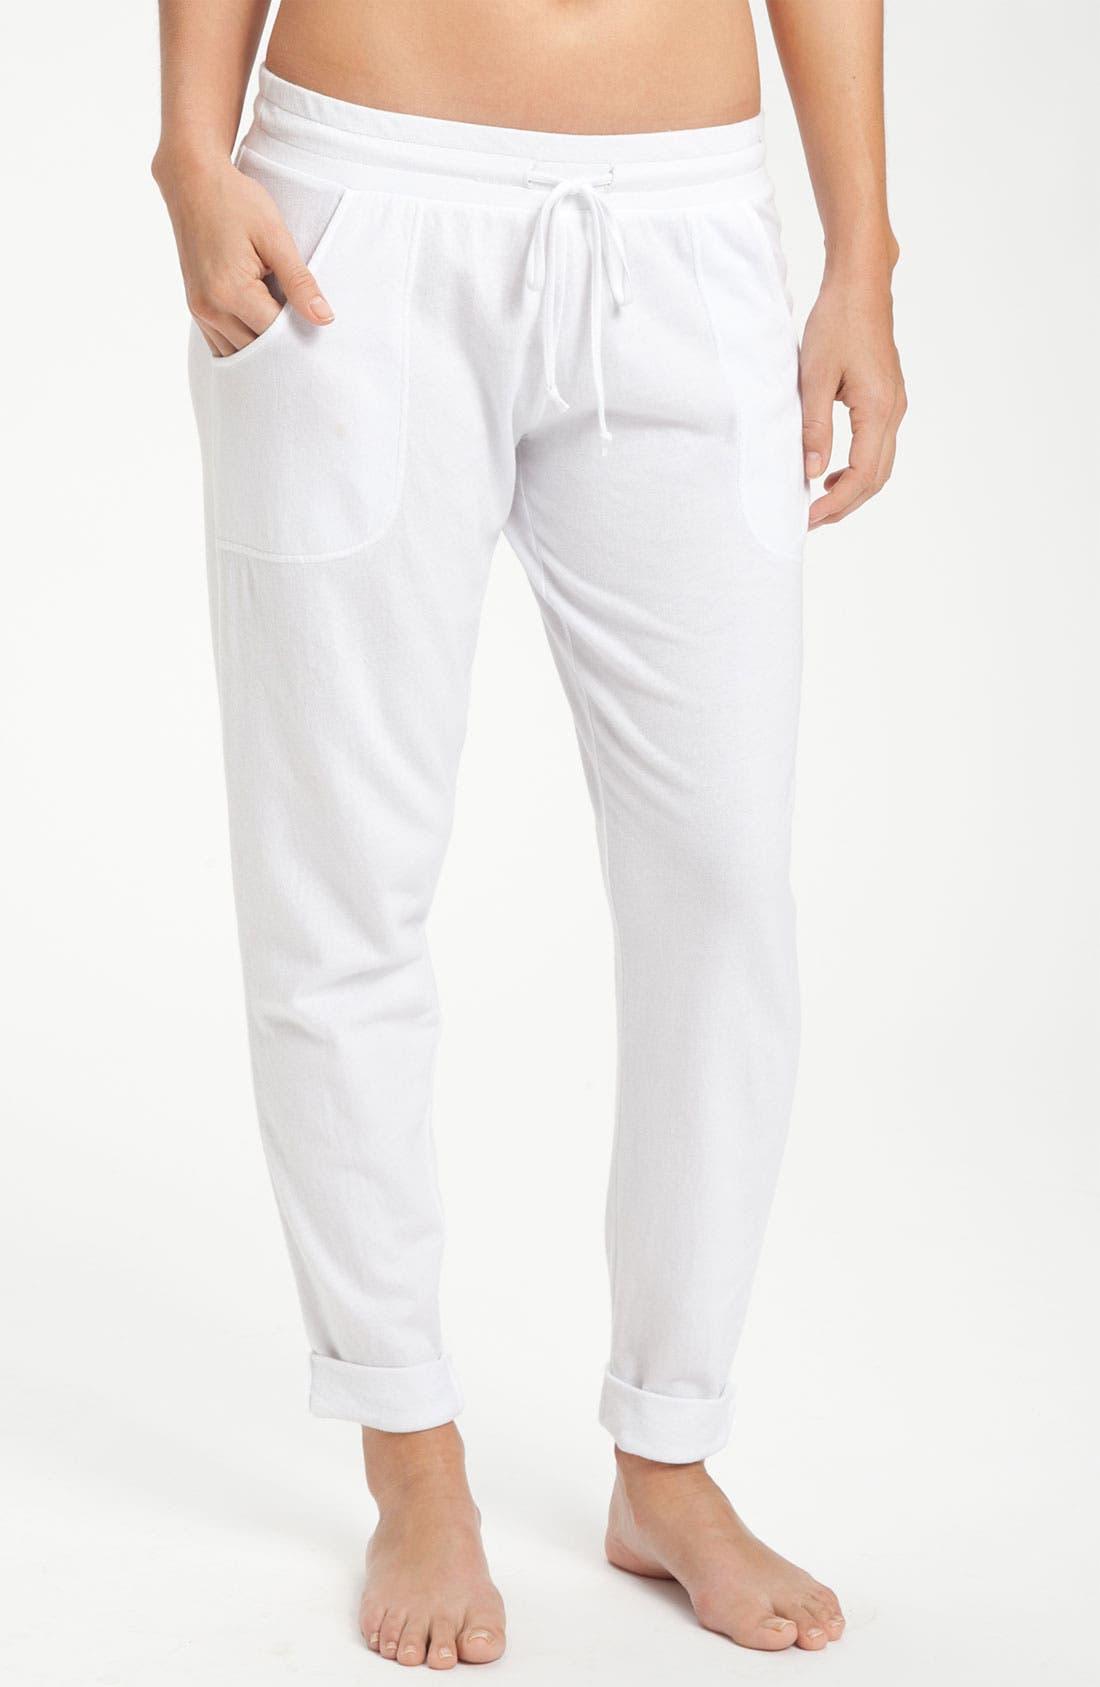 Main Image - Make + Model 'Close to You' Crop Pants